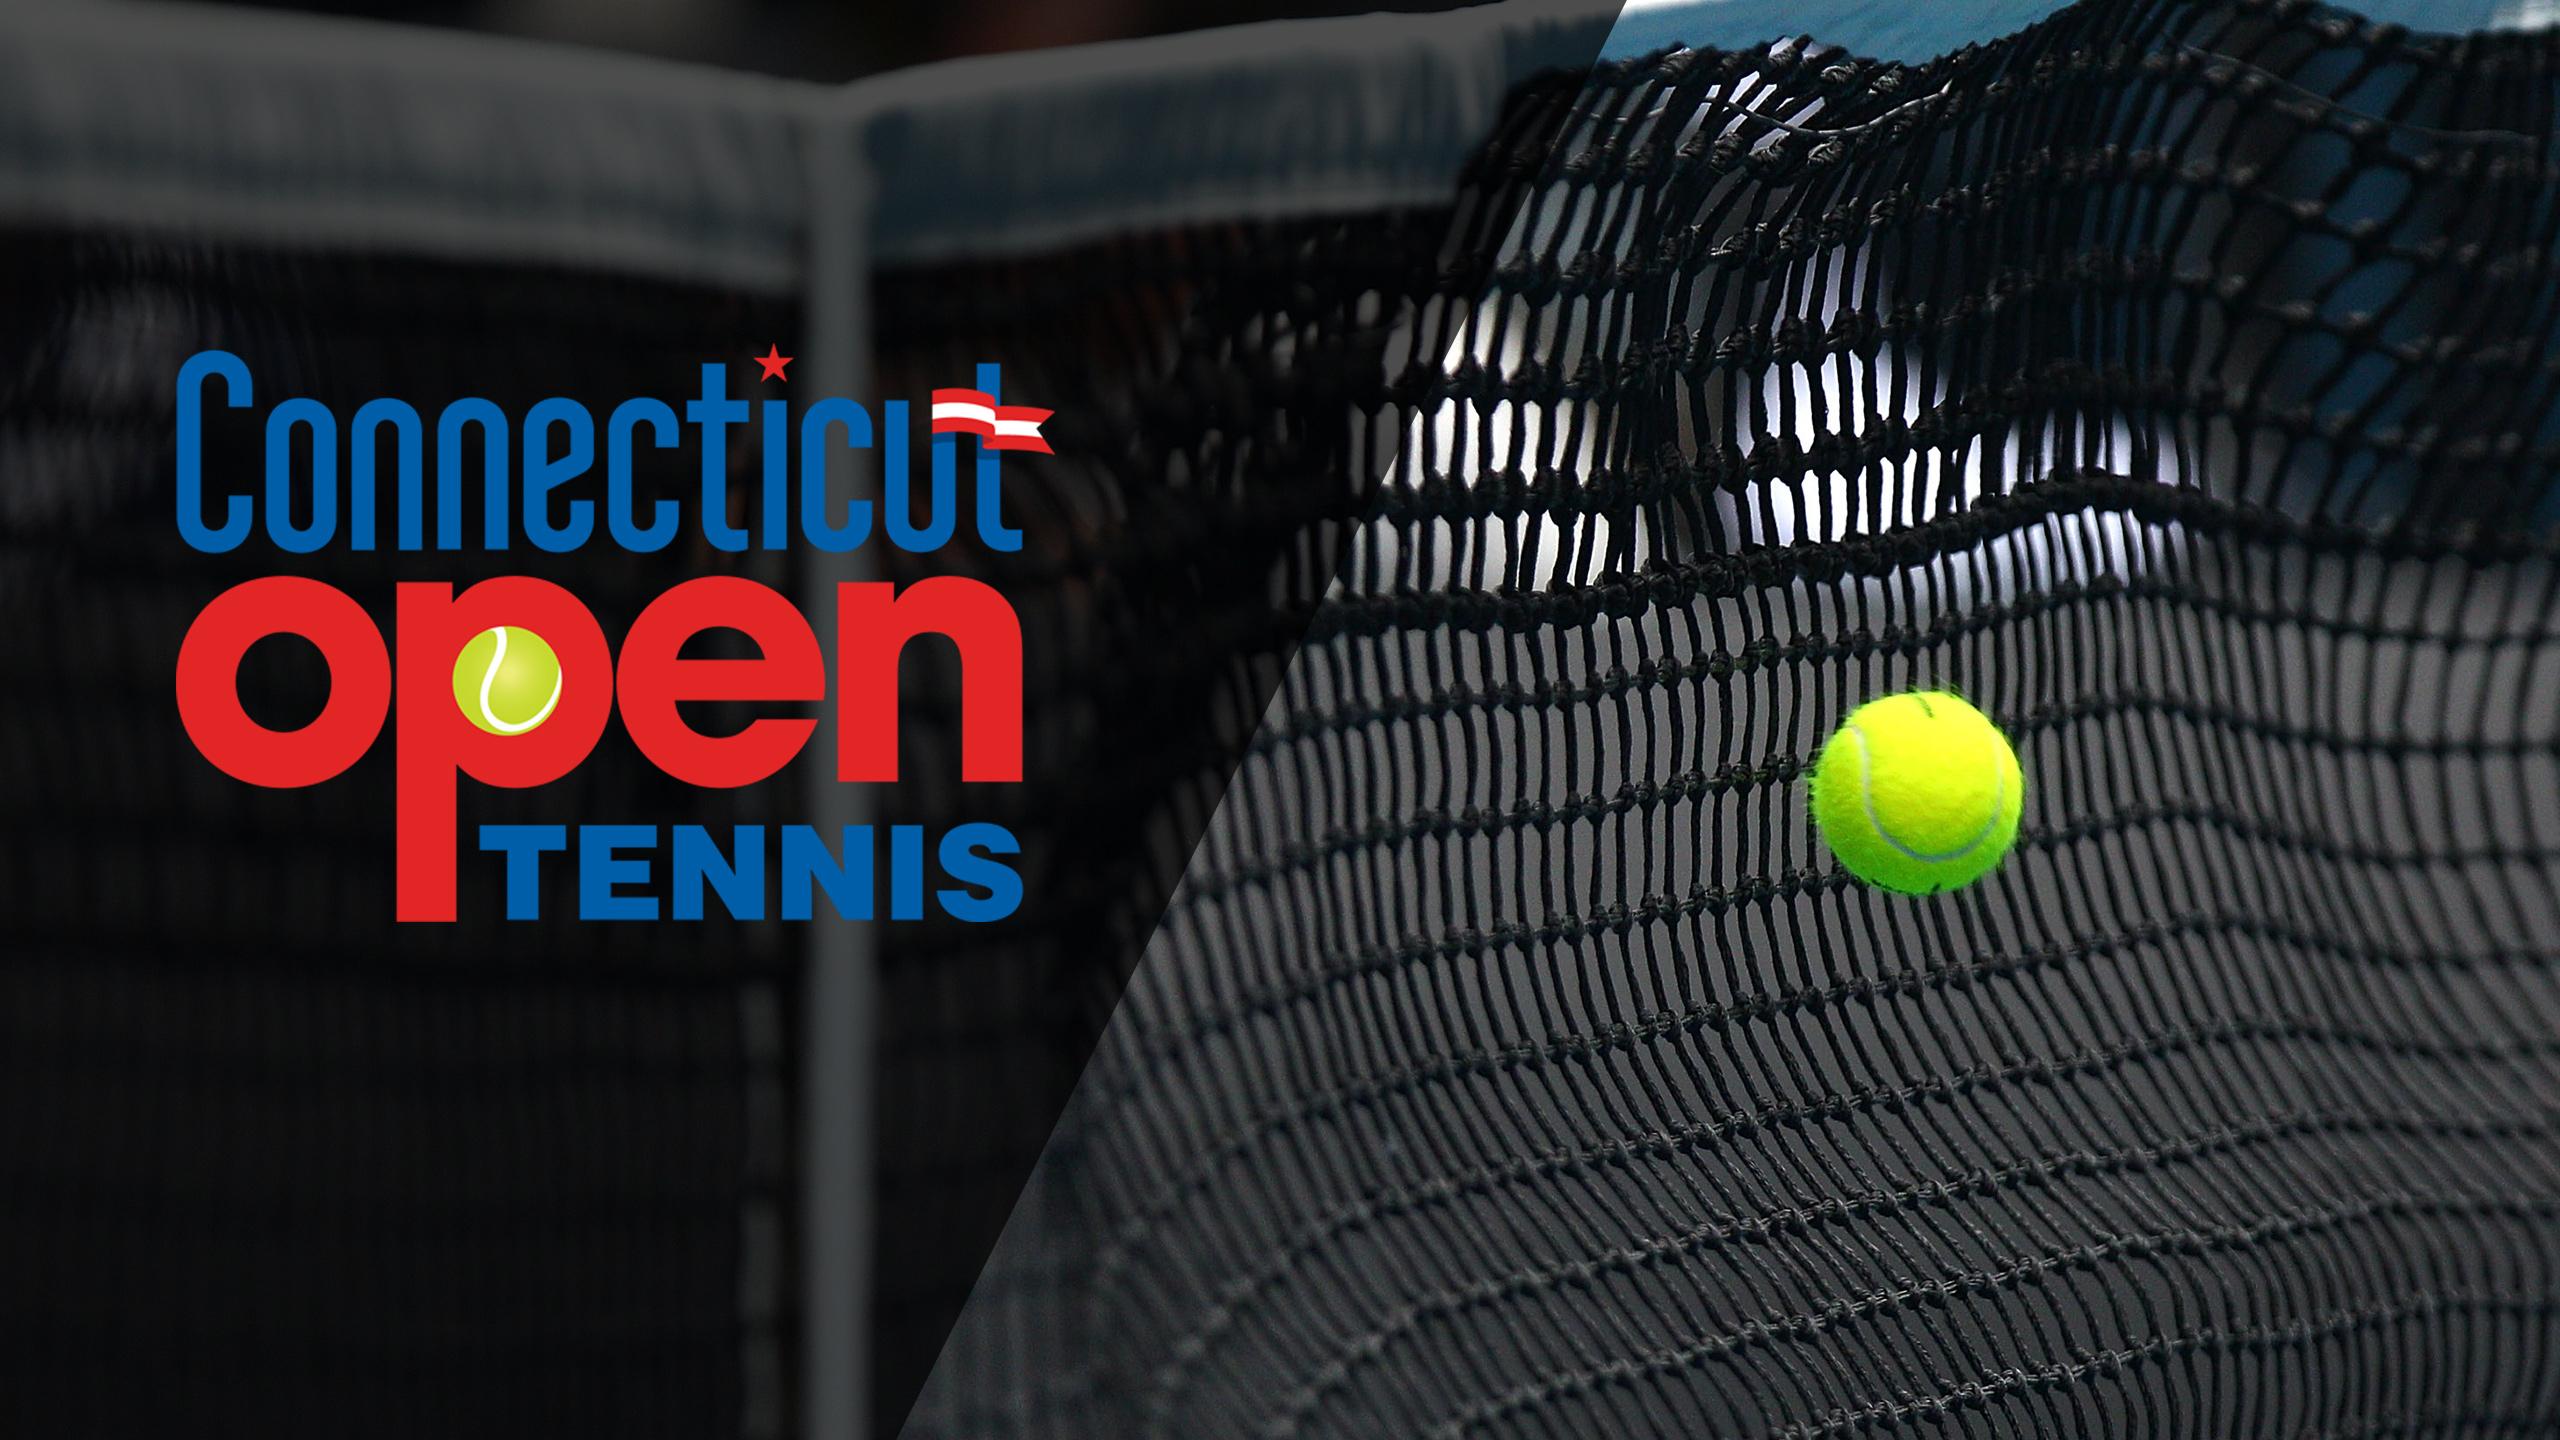 2018 US Open Series - Connecticut Open (Quarterfinals #1, #2 & #3)